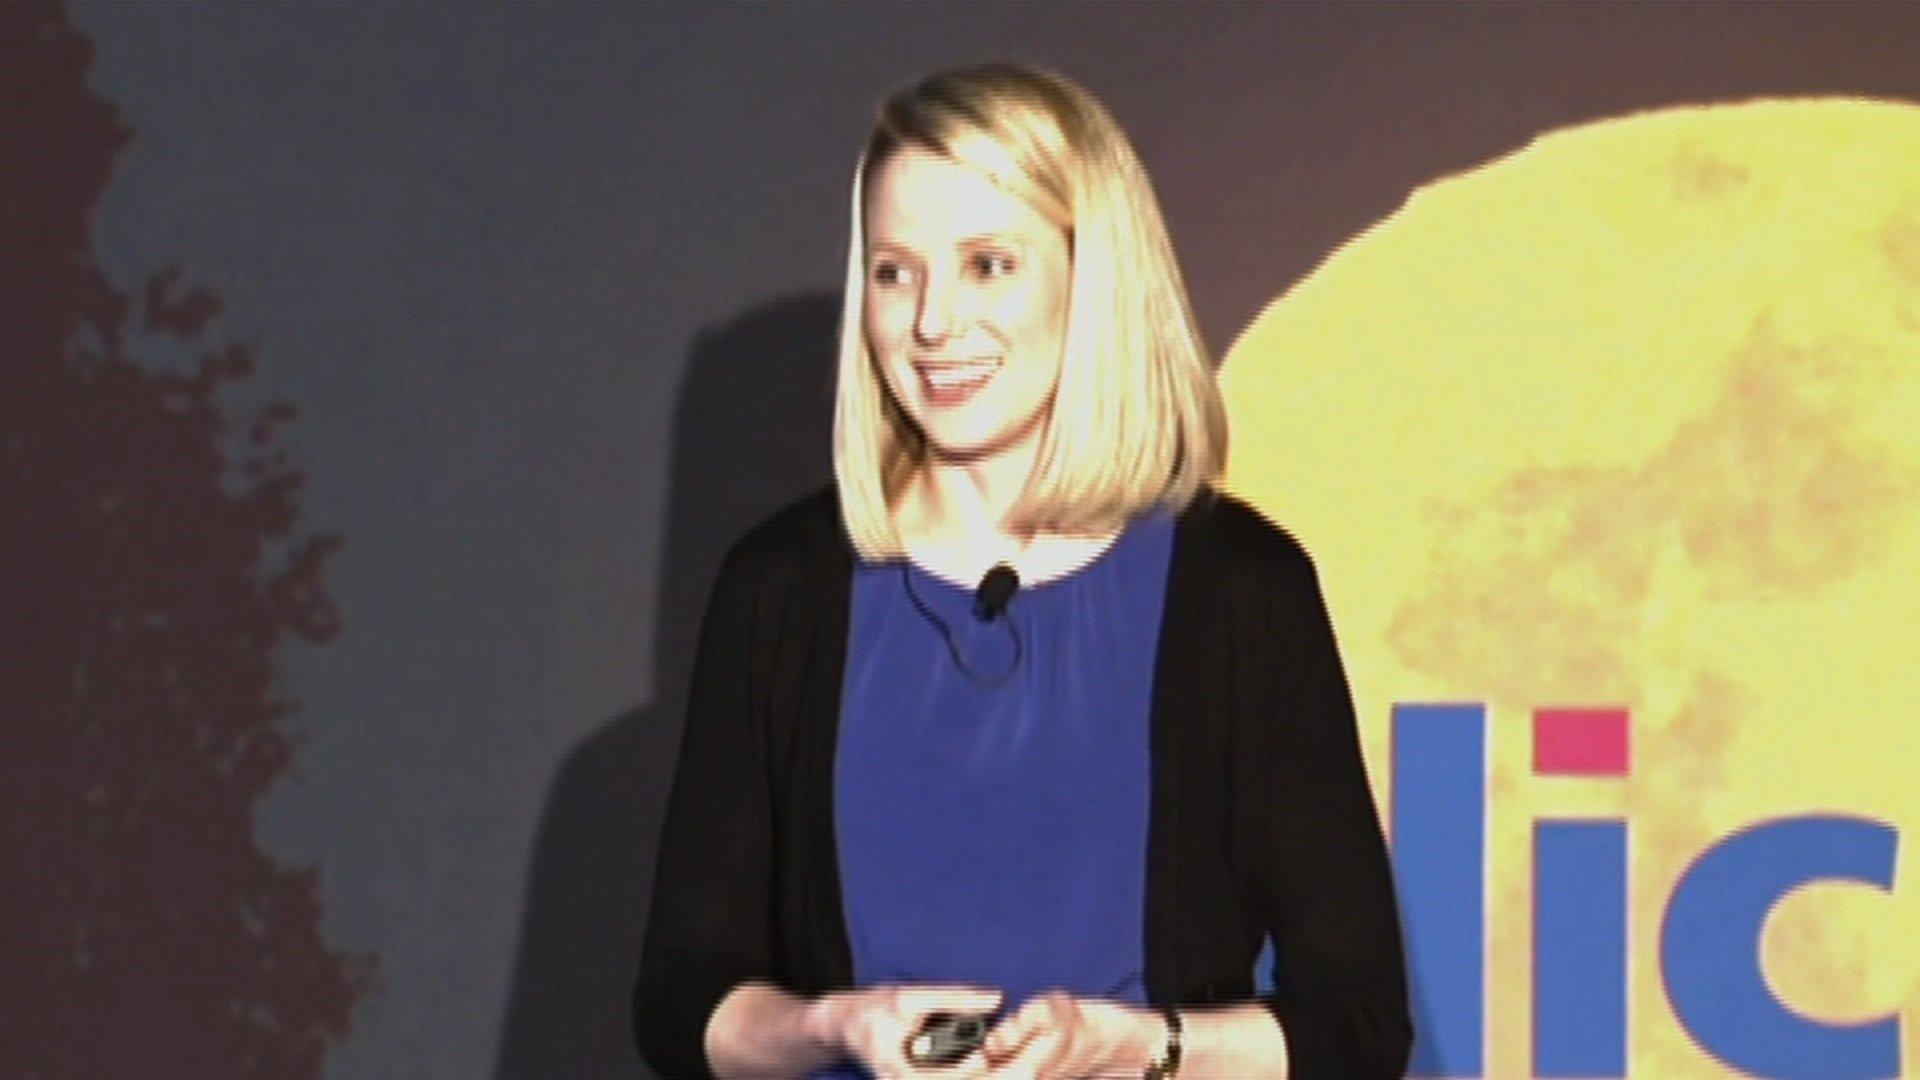 Marissa Mayer won't be running Yahoo once Verizon deal closes